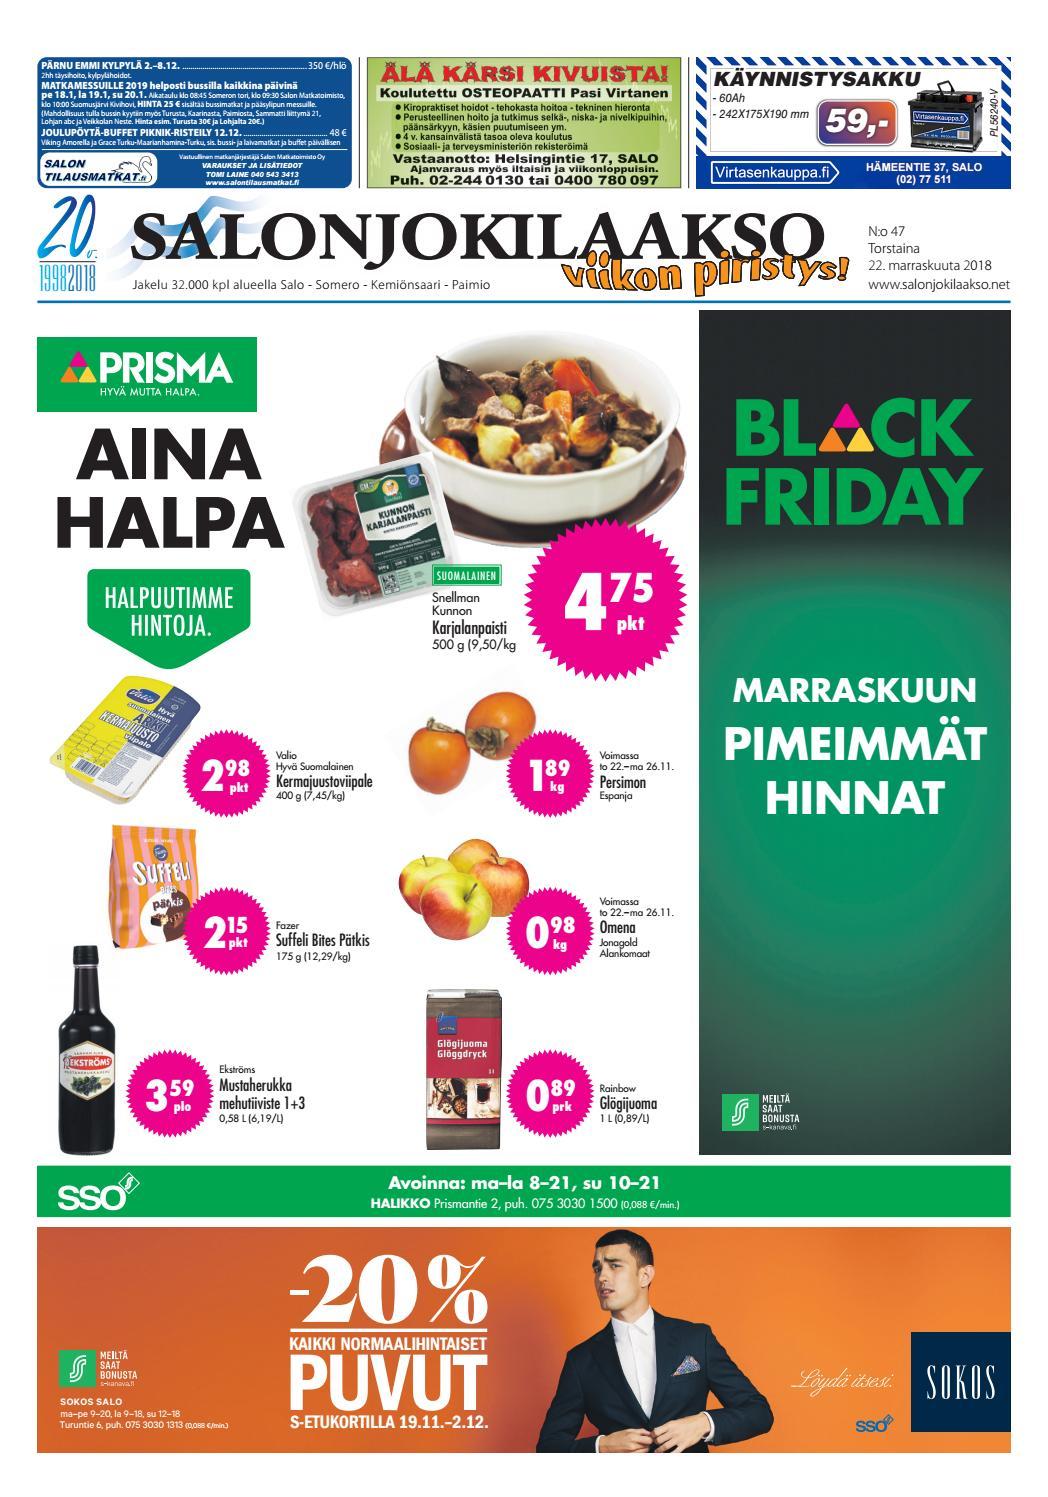 Salonjokilaakso vko 47 2018 by Salonjokilaakso lehti - issuu 78b8ca62ec